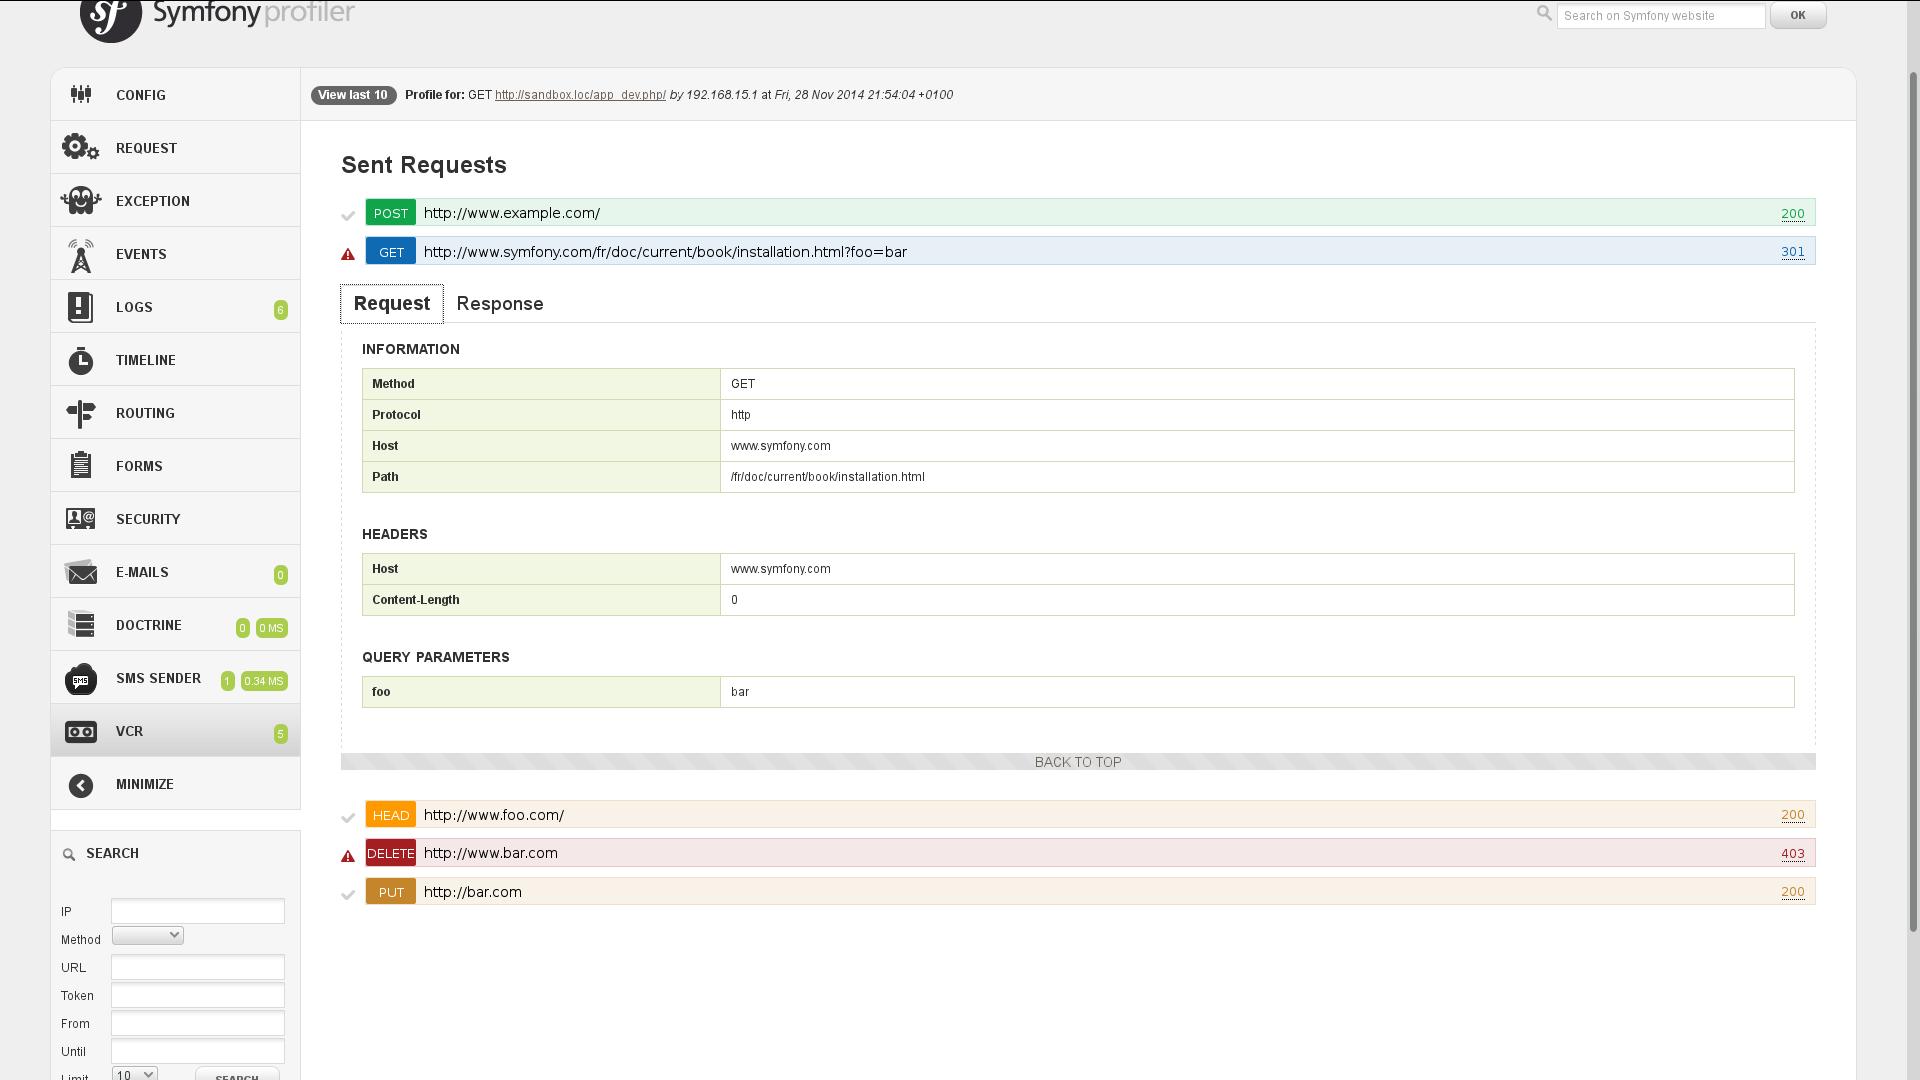 PHP-VCR Symfony web profiler panel - request details